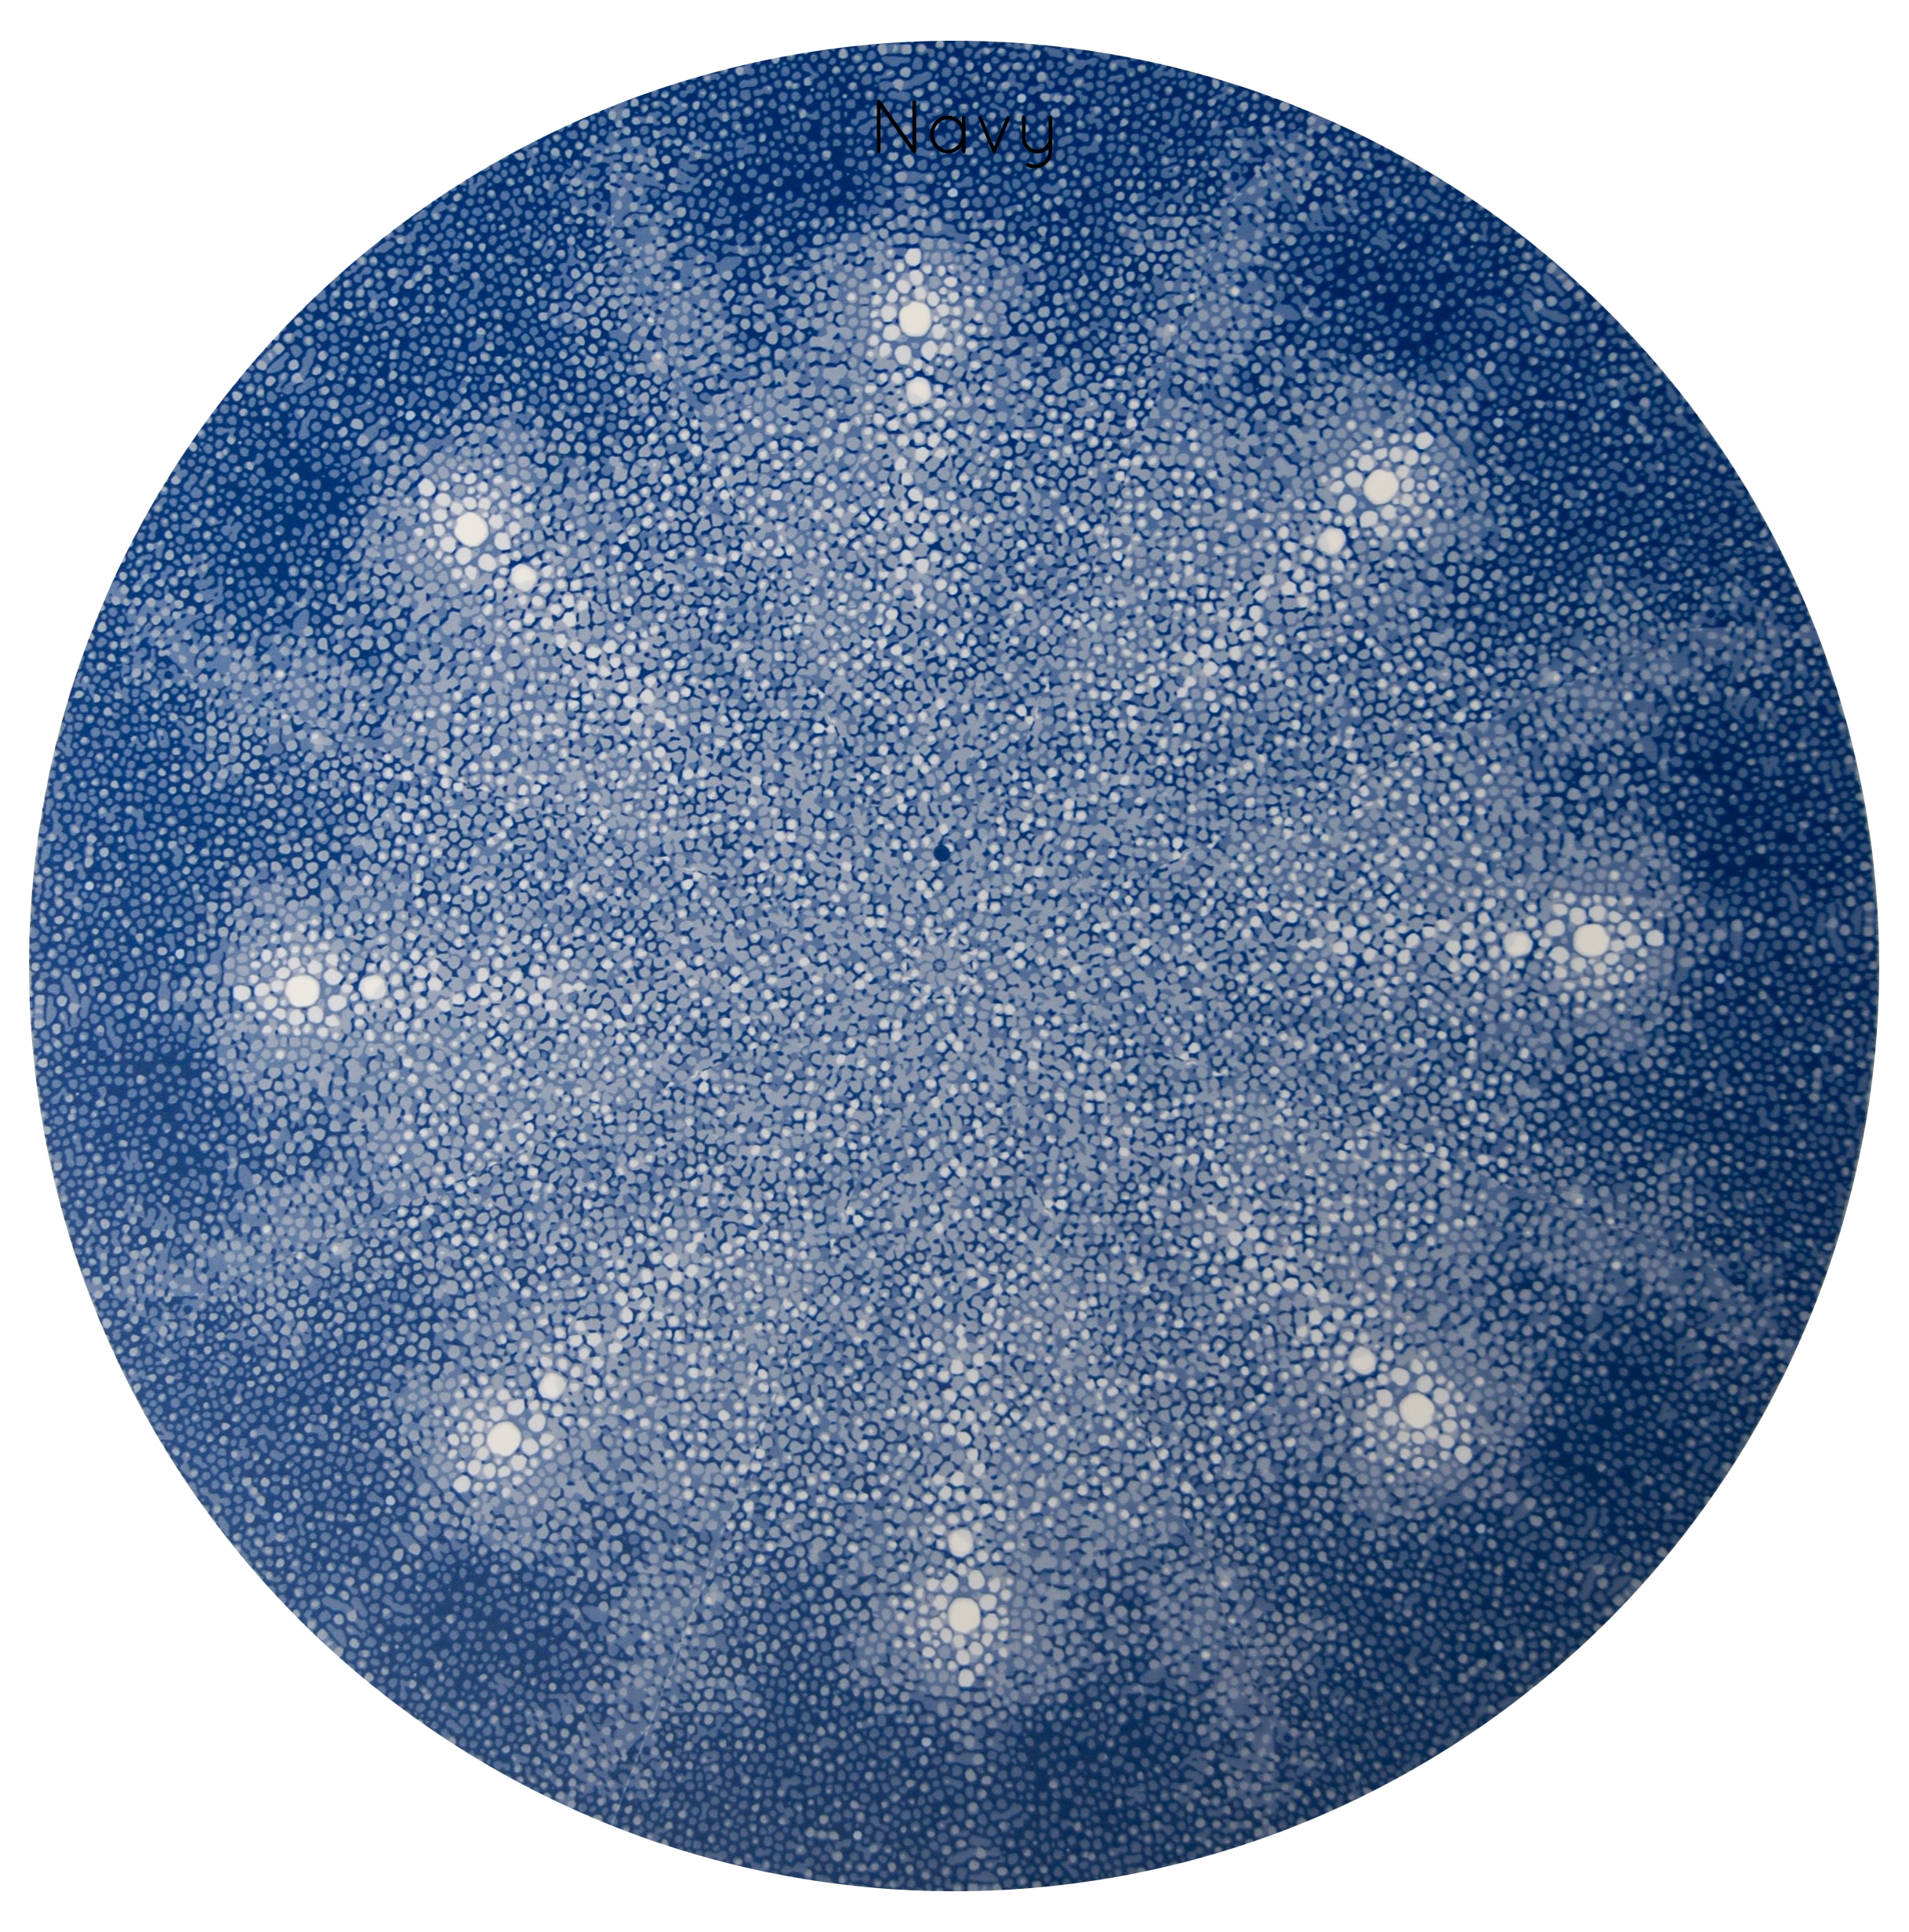 drk blue shagreen.jpg